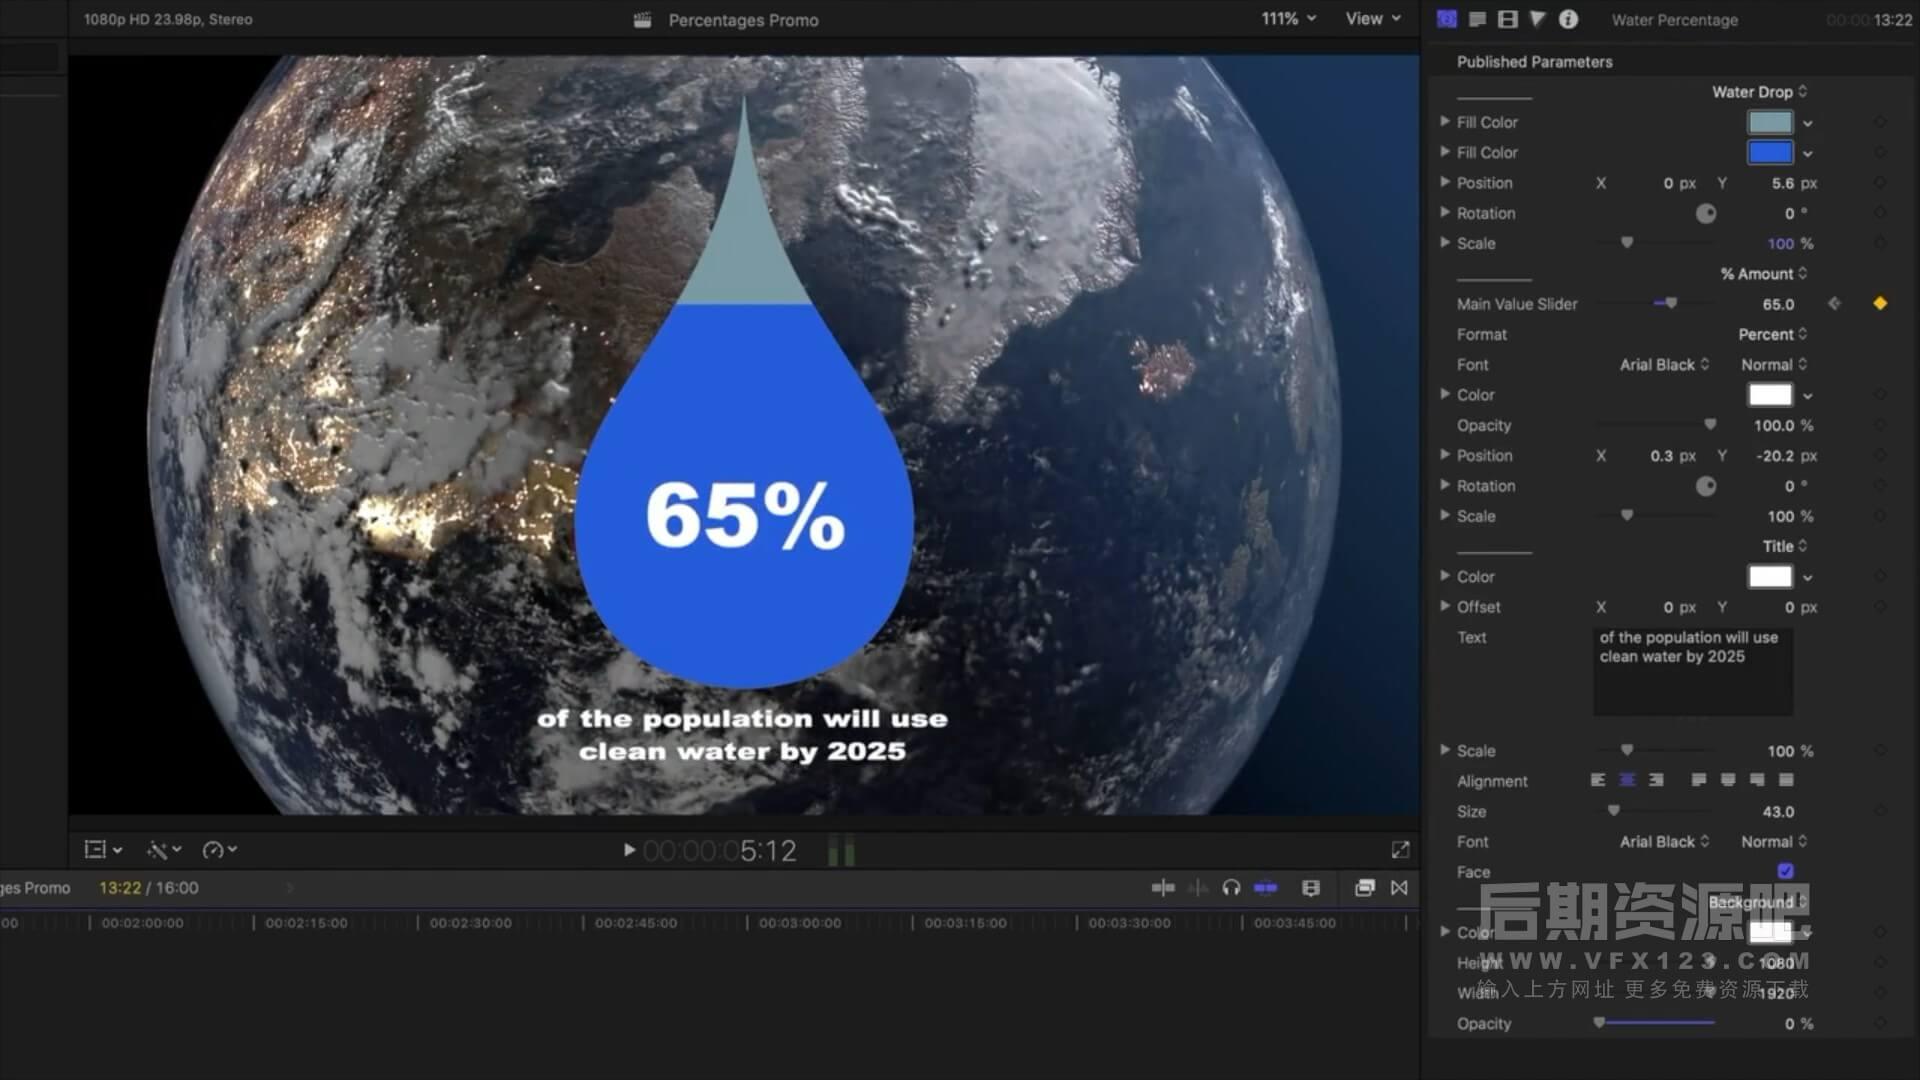 Fcpx插件 6款卡通交互式可自定义百分比滑块动画预设 V1 Percentage Sliders